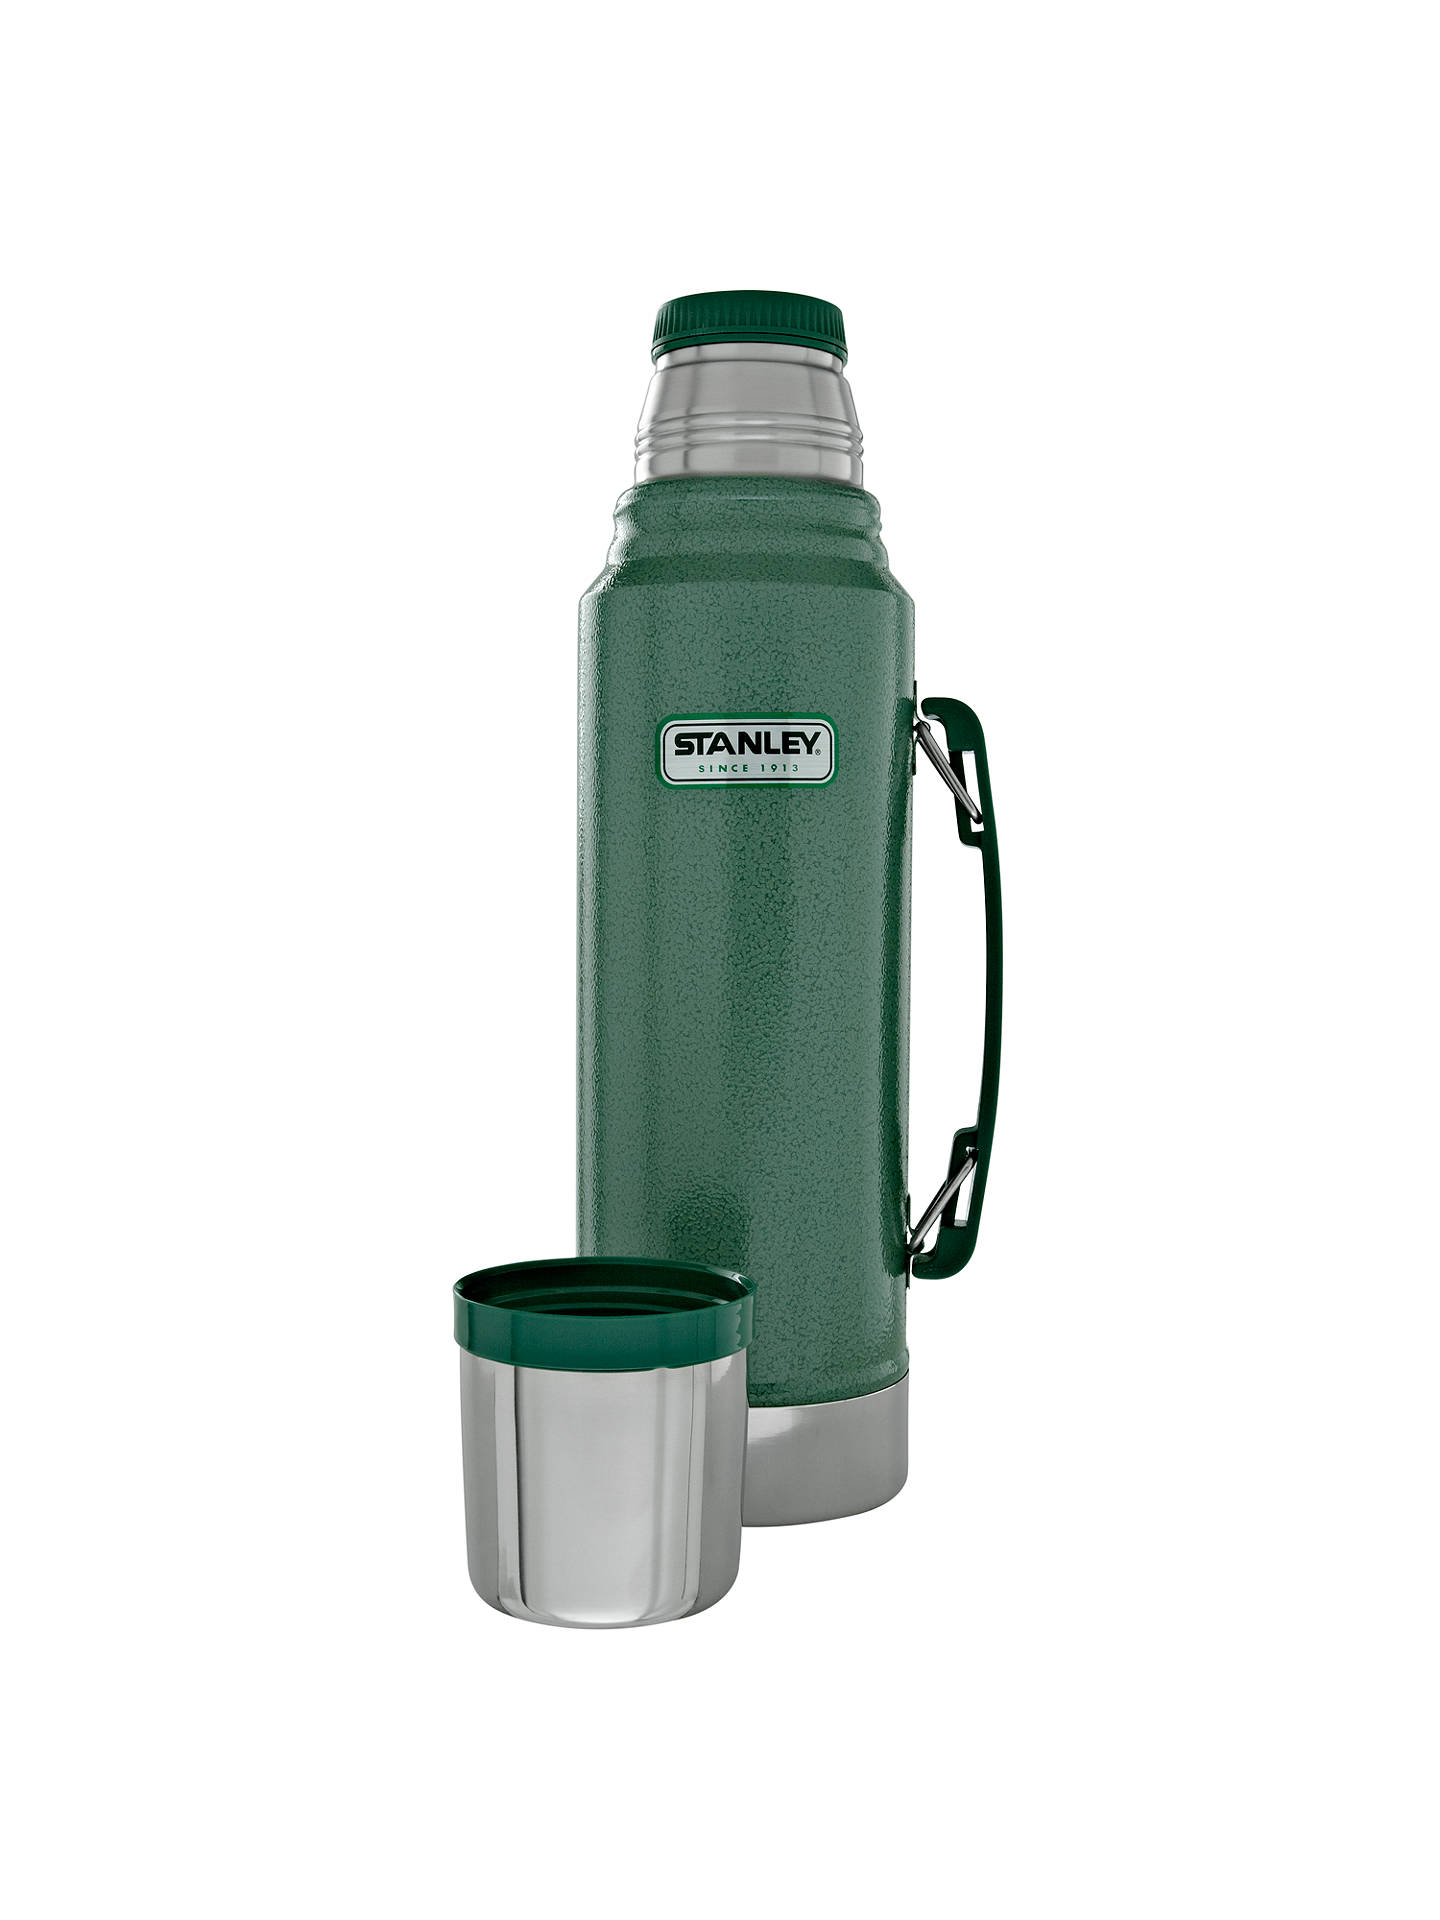 Stanley Classic Vacuum Flask, Hammertone Green, 1L